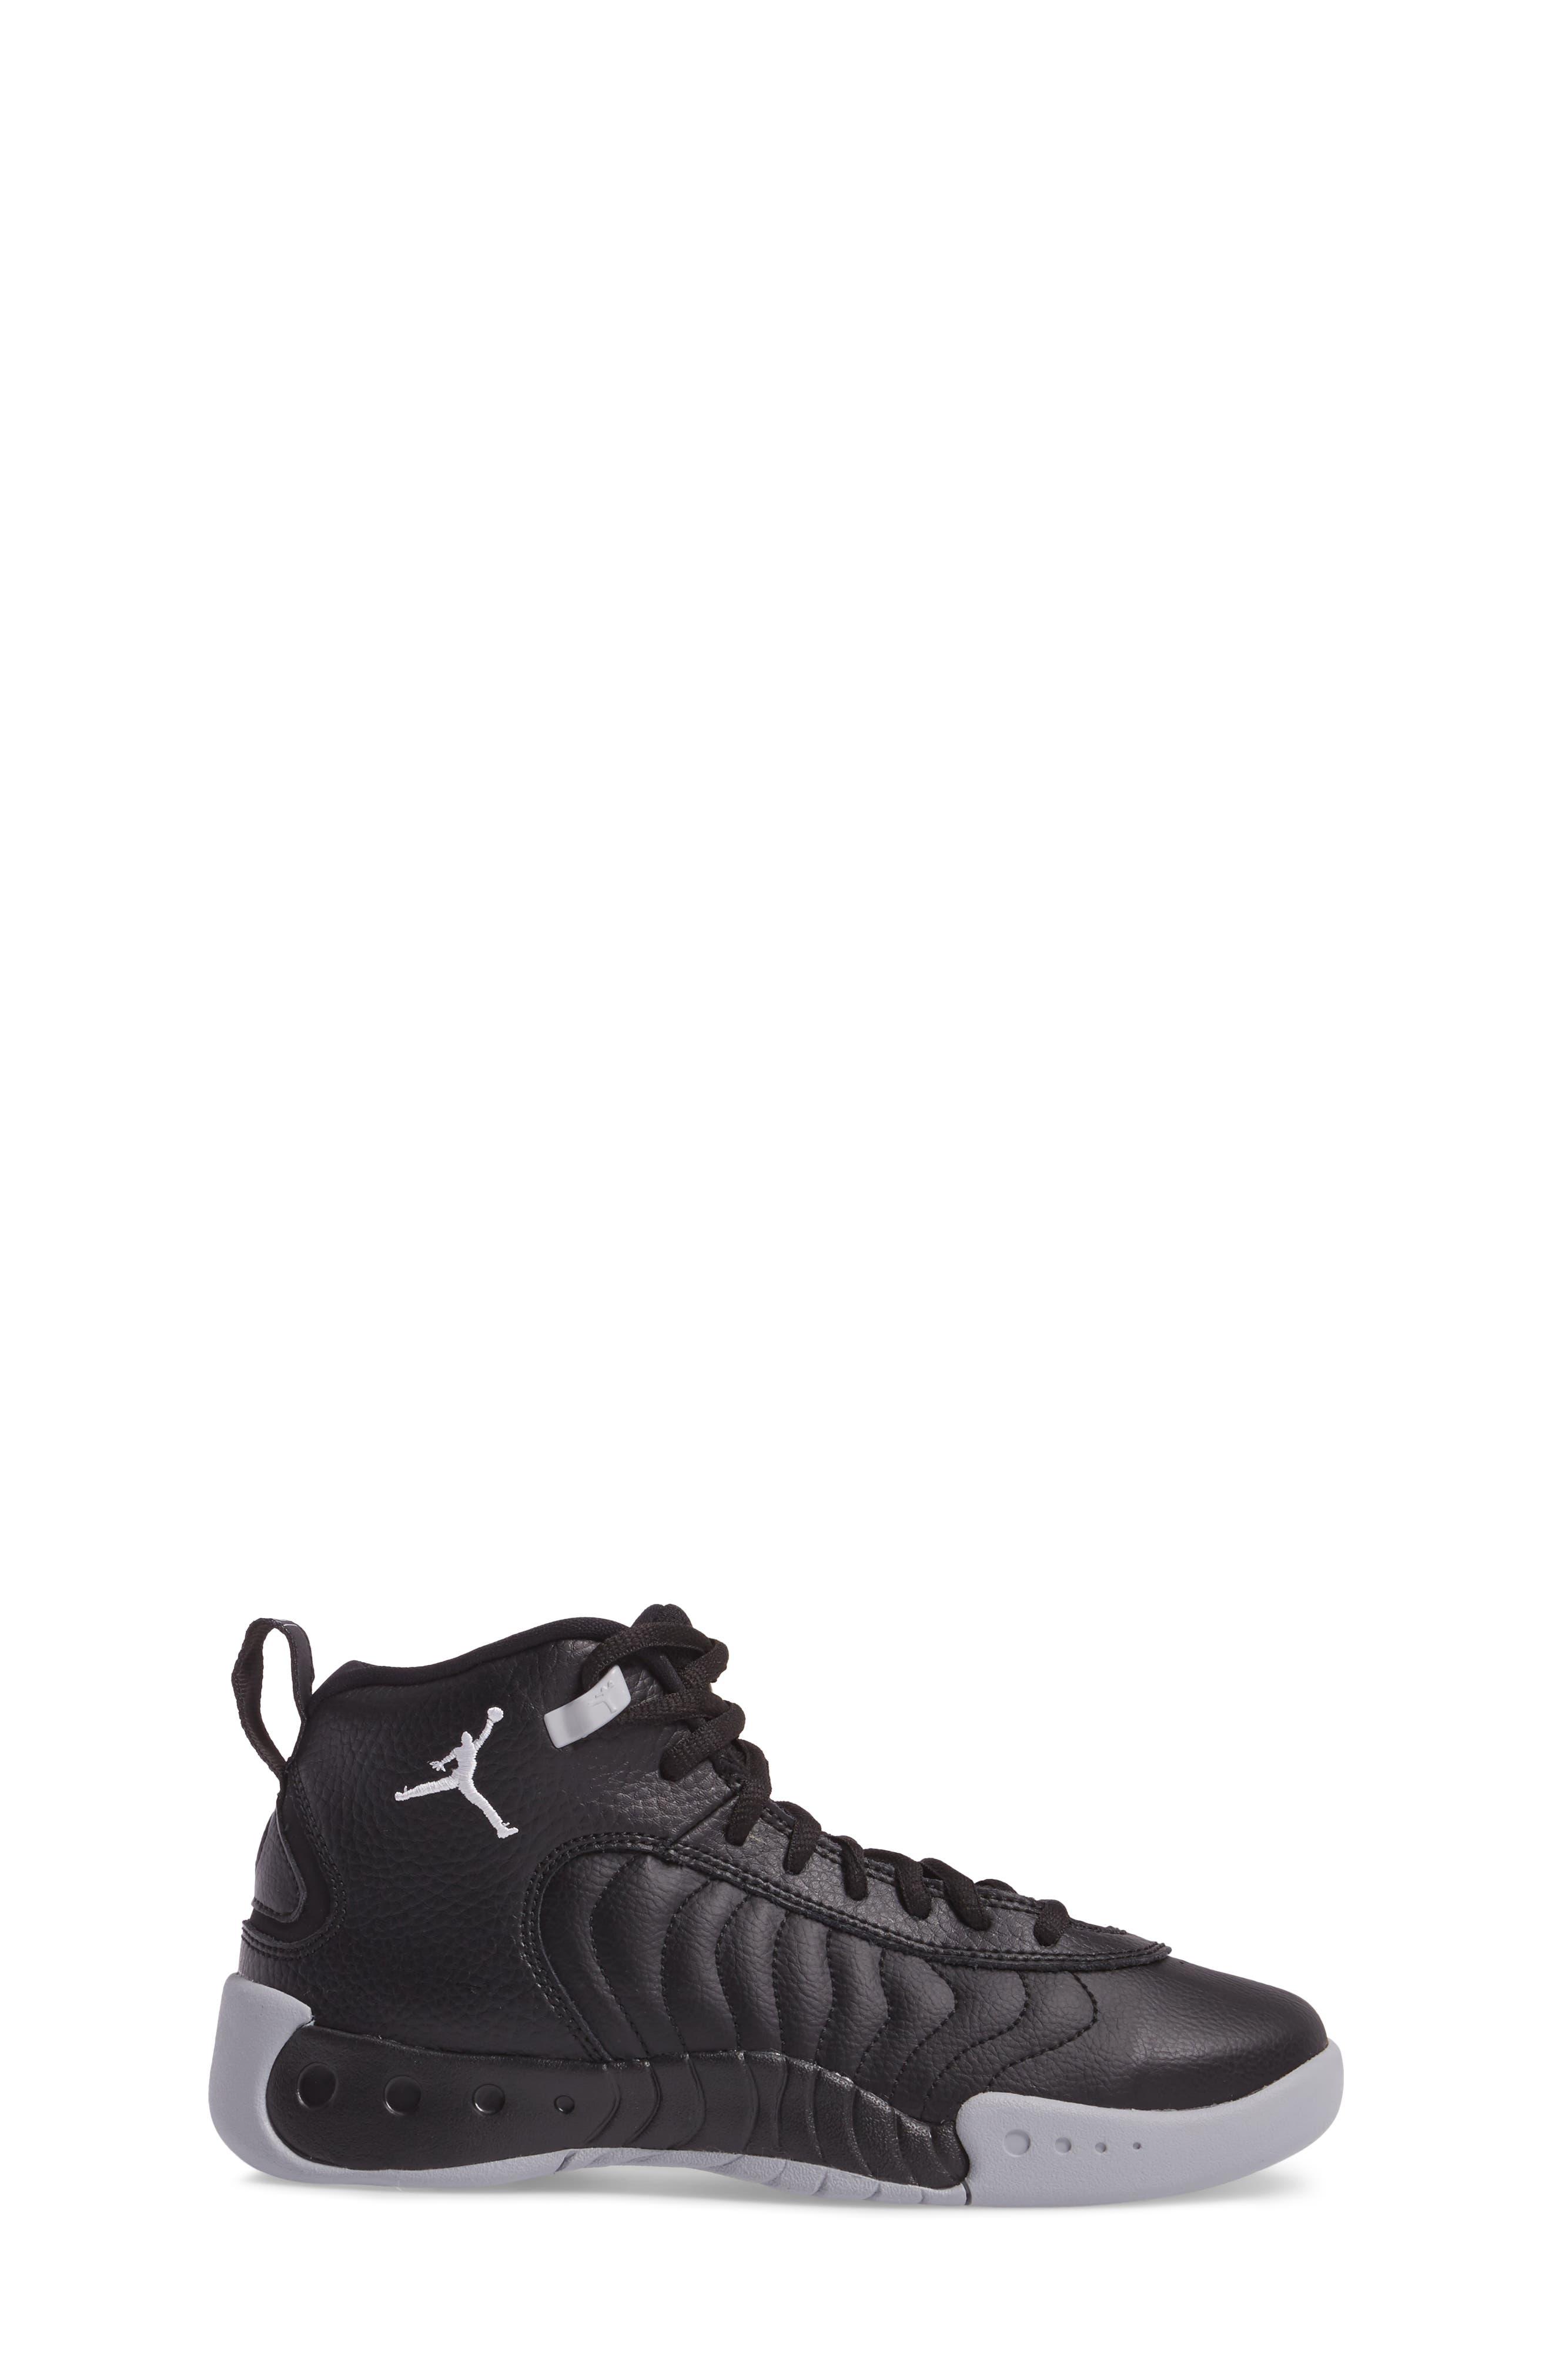 Jumpman Pro BG Mid Top Sneaker,                             Alternate thumbnail 3, color,                             Black/ White-Wolf Grey